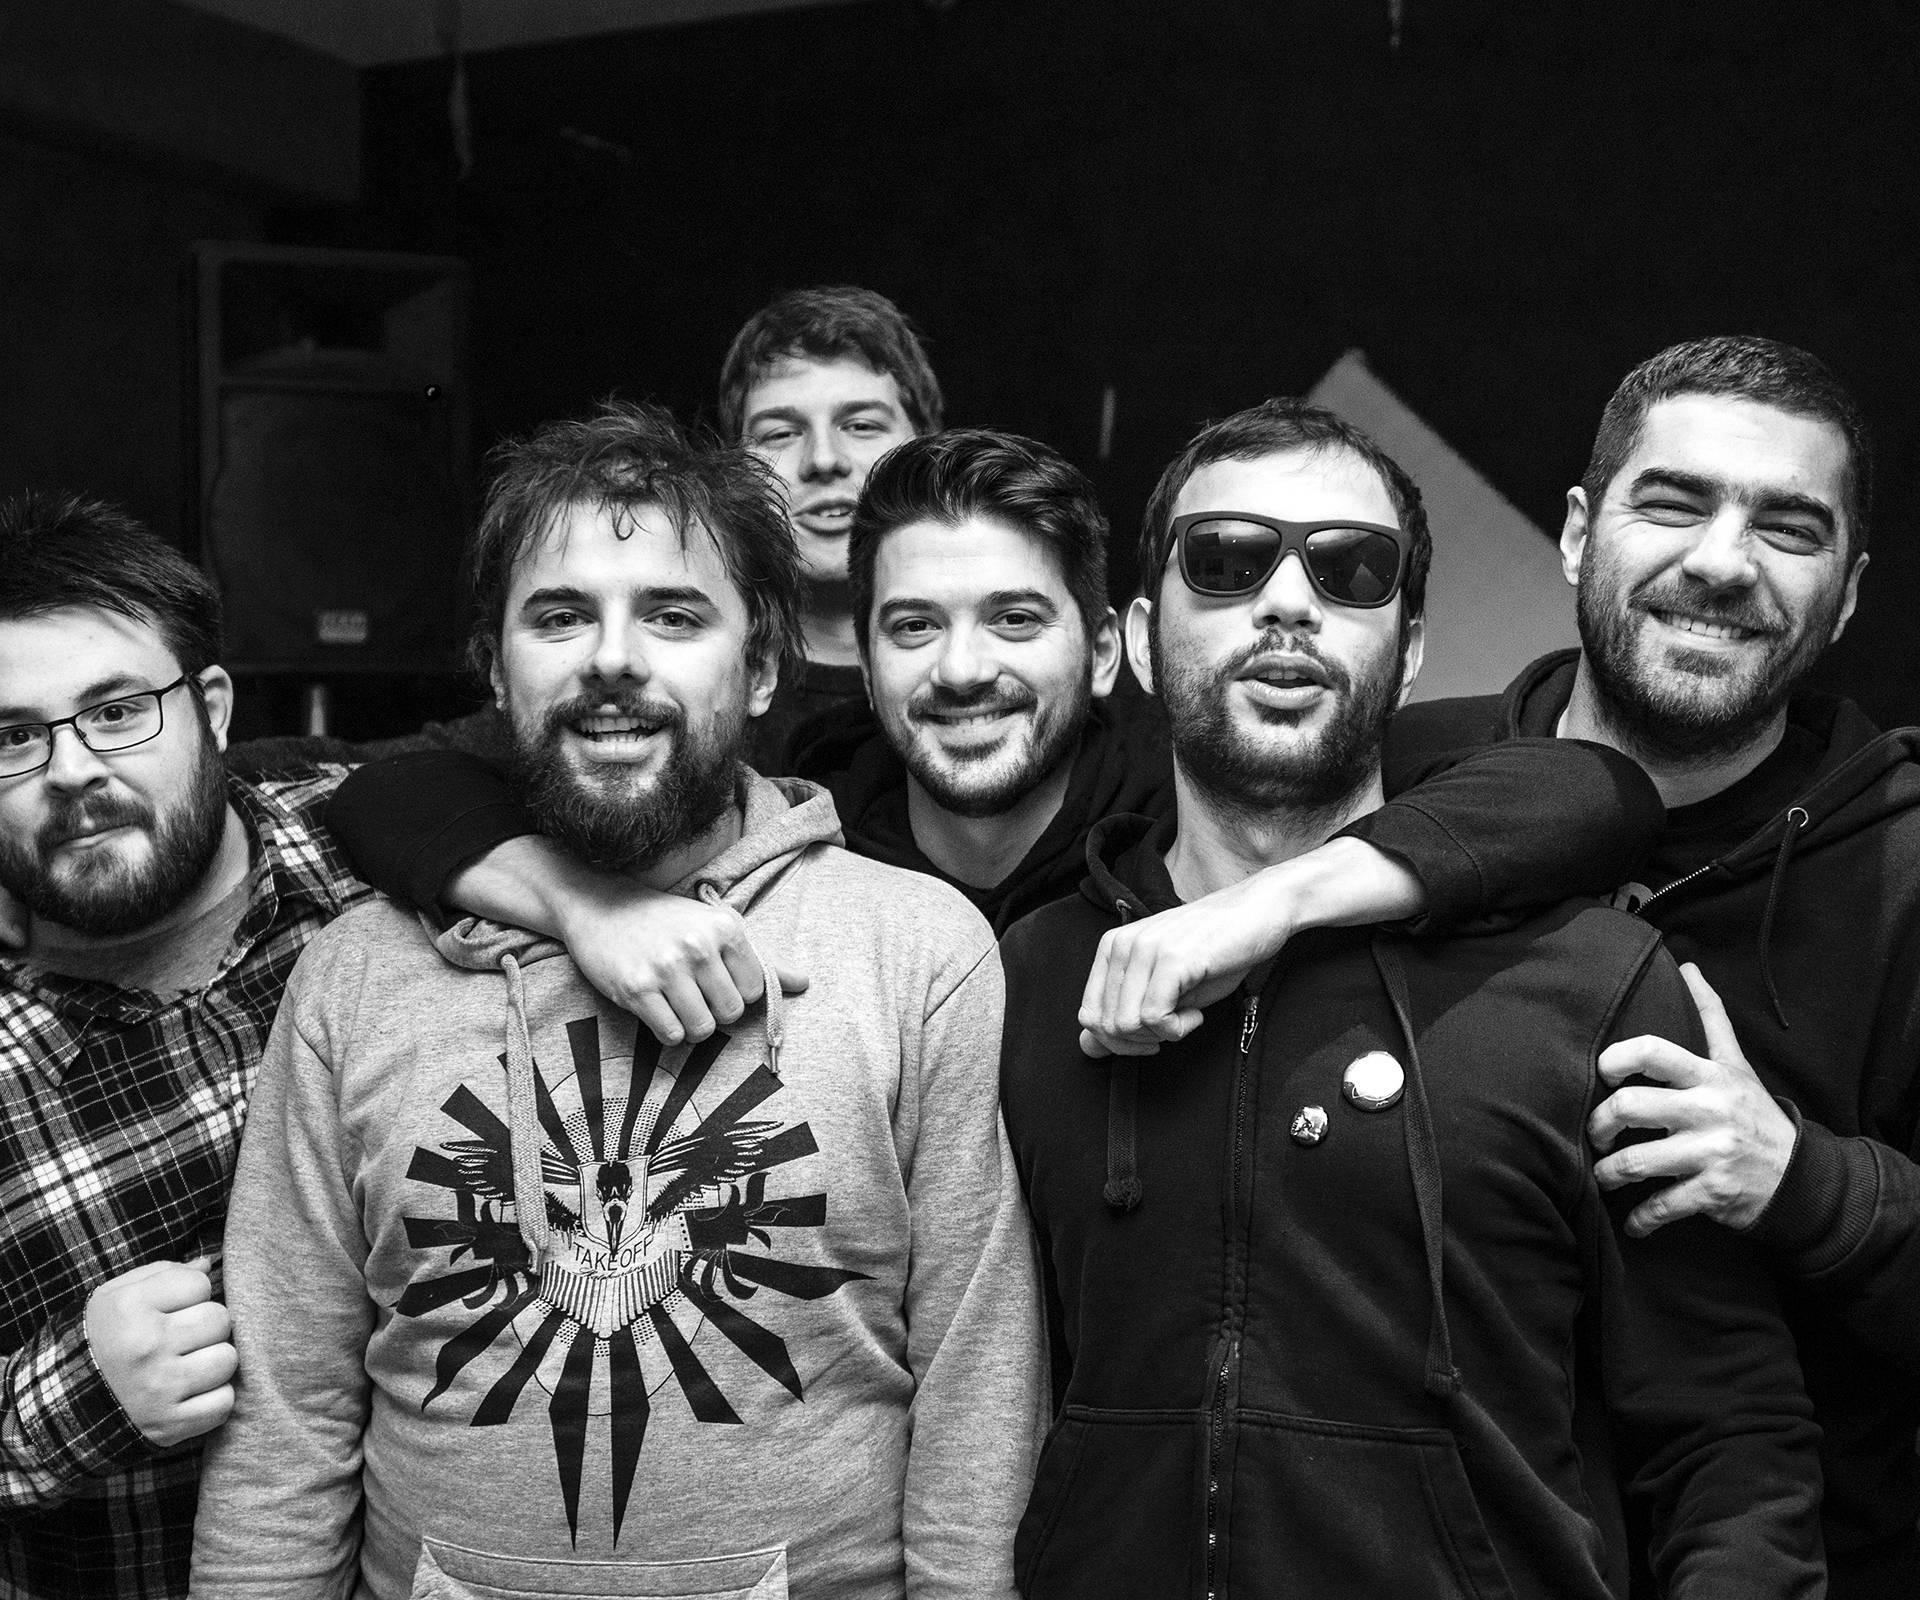 Punk rock bend Mašinko kao predgrupa Dubioza Kolektivu